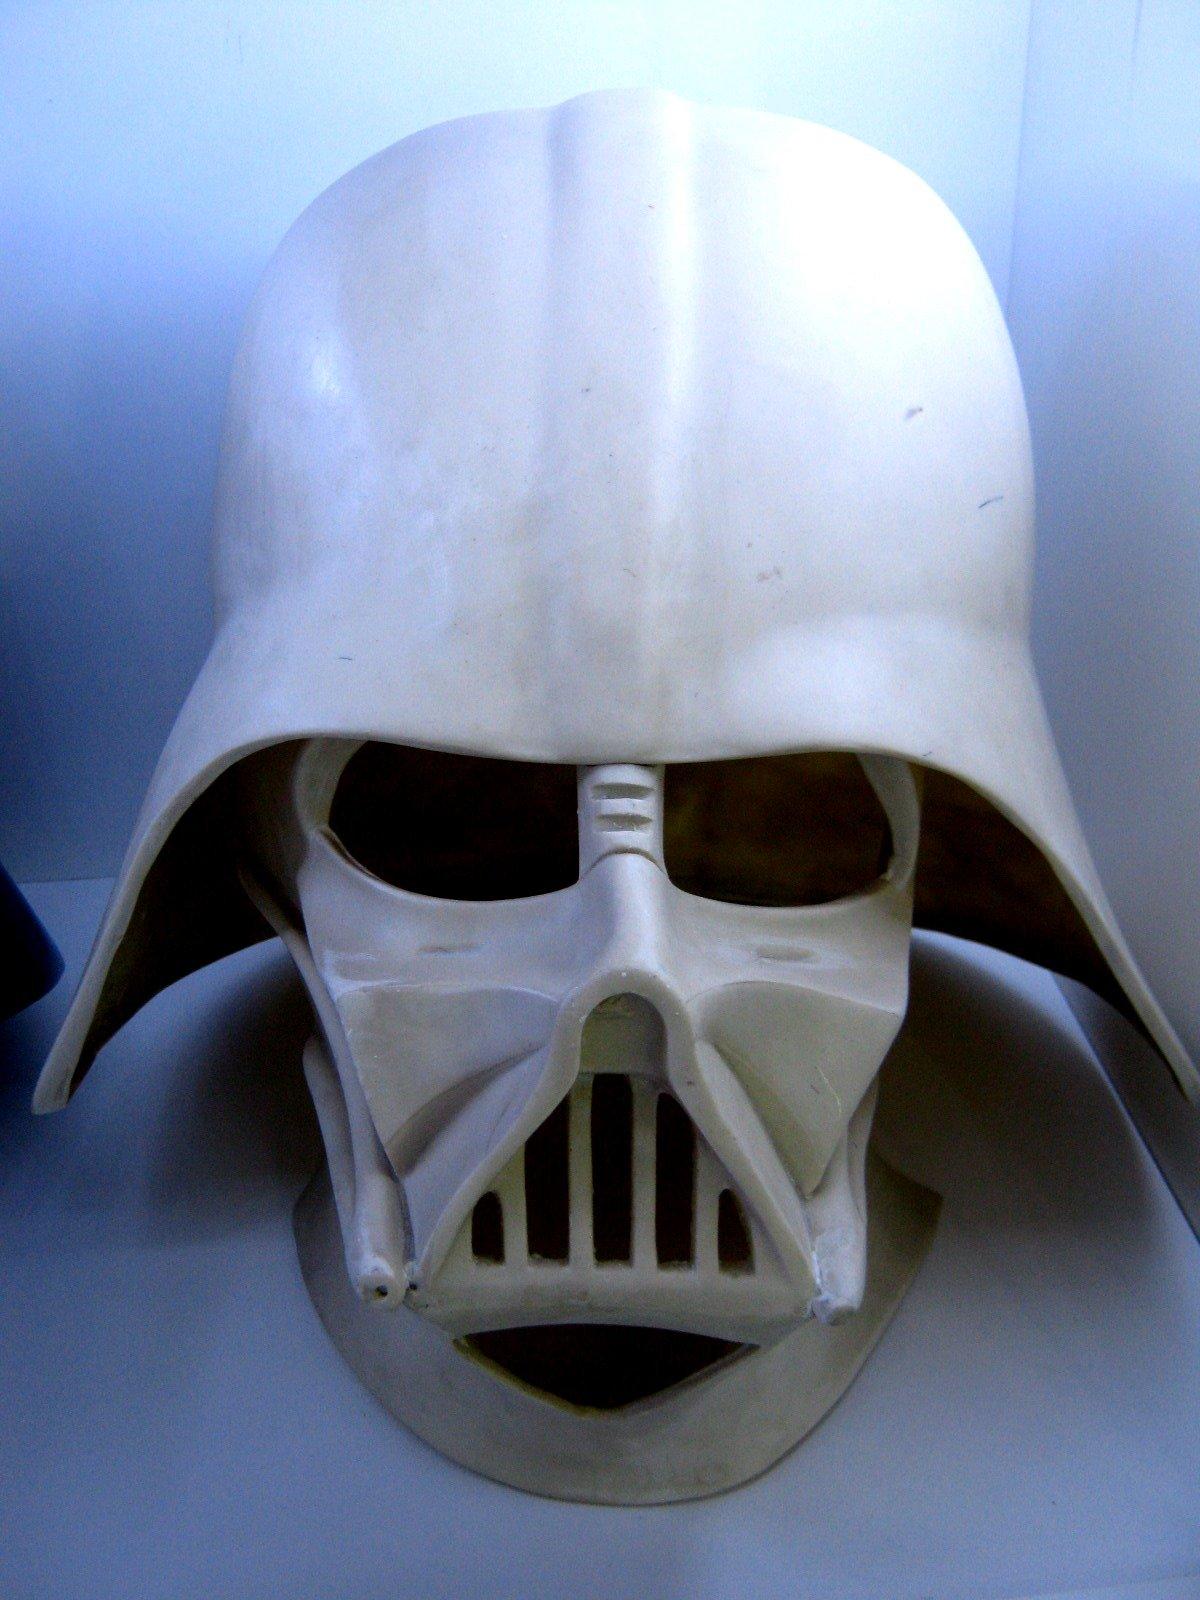 1:1 Star Wars Darth Vader Fiber Glass 2 Piece Raw Cast Helmet